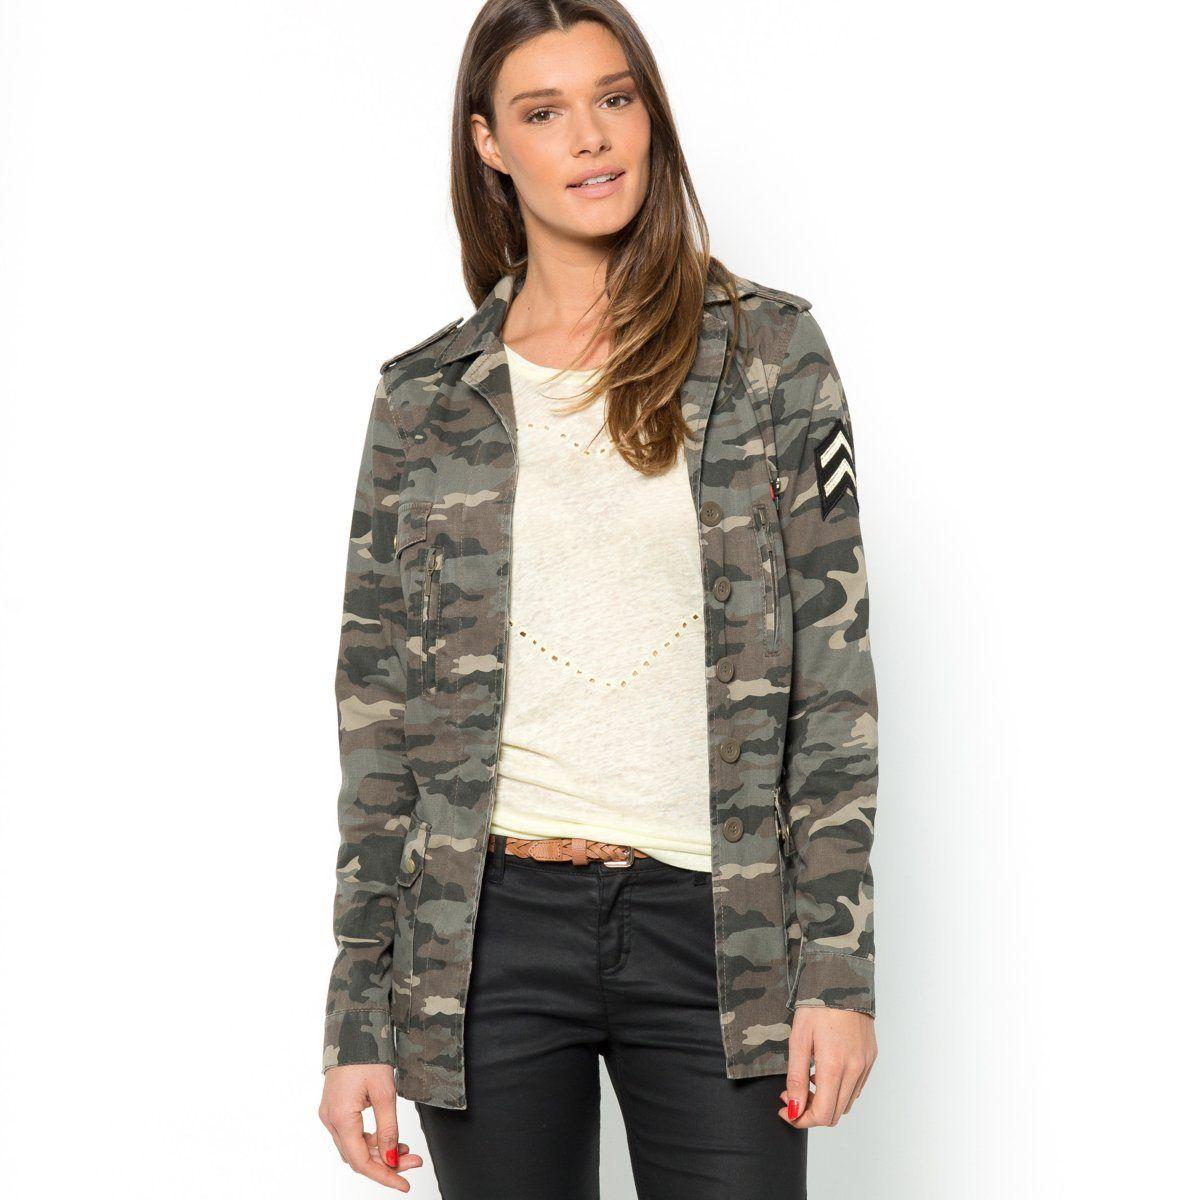 veste army coton imprim camouflage manteau. Black Bedroom Furniture Sets. Home Design Ideas